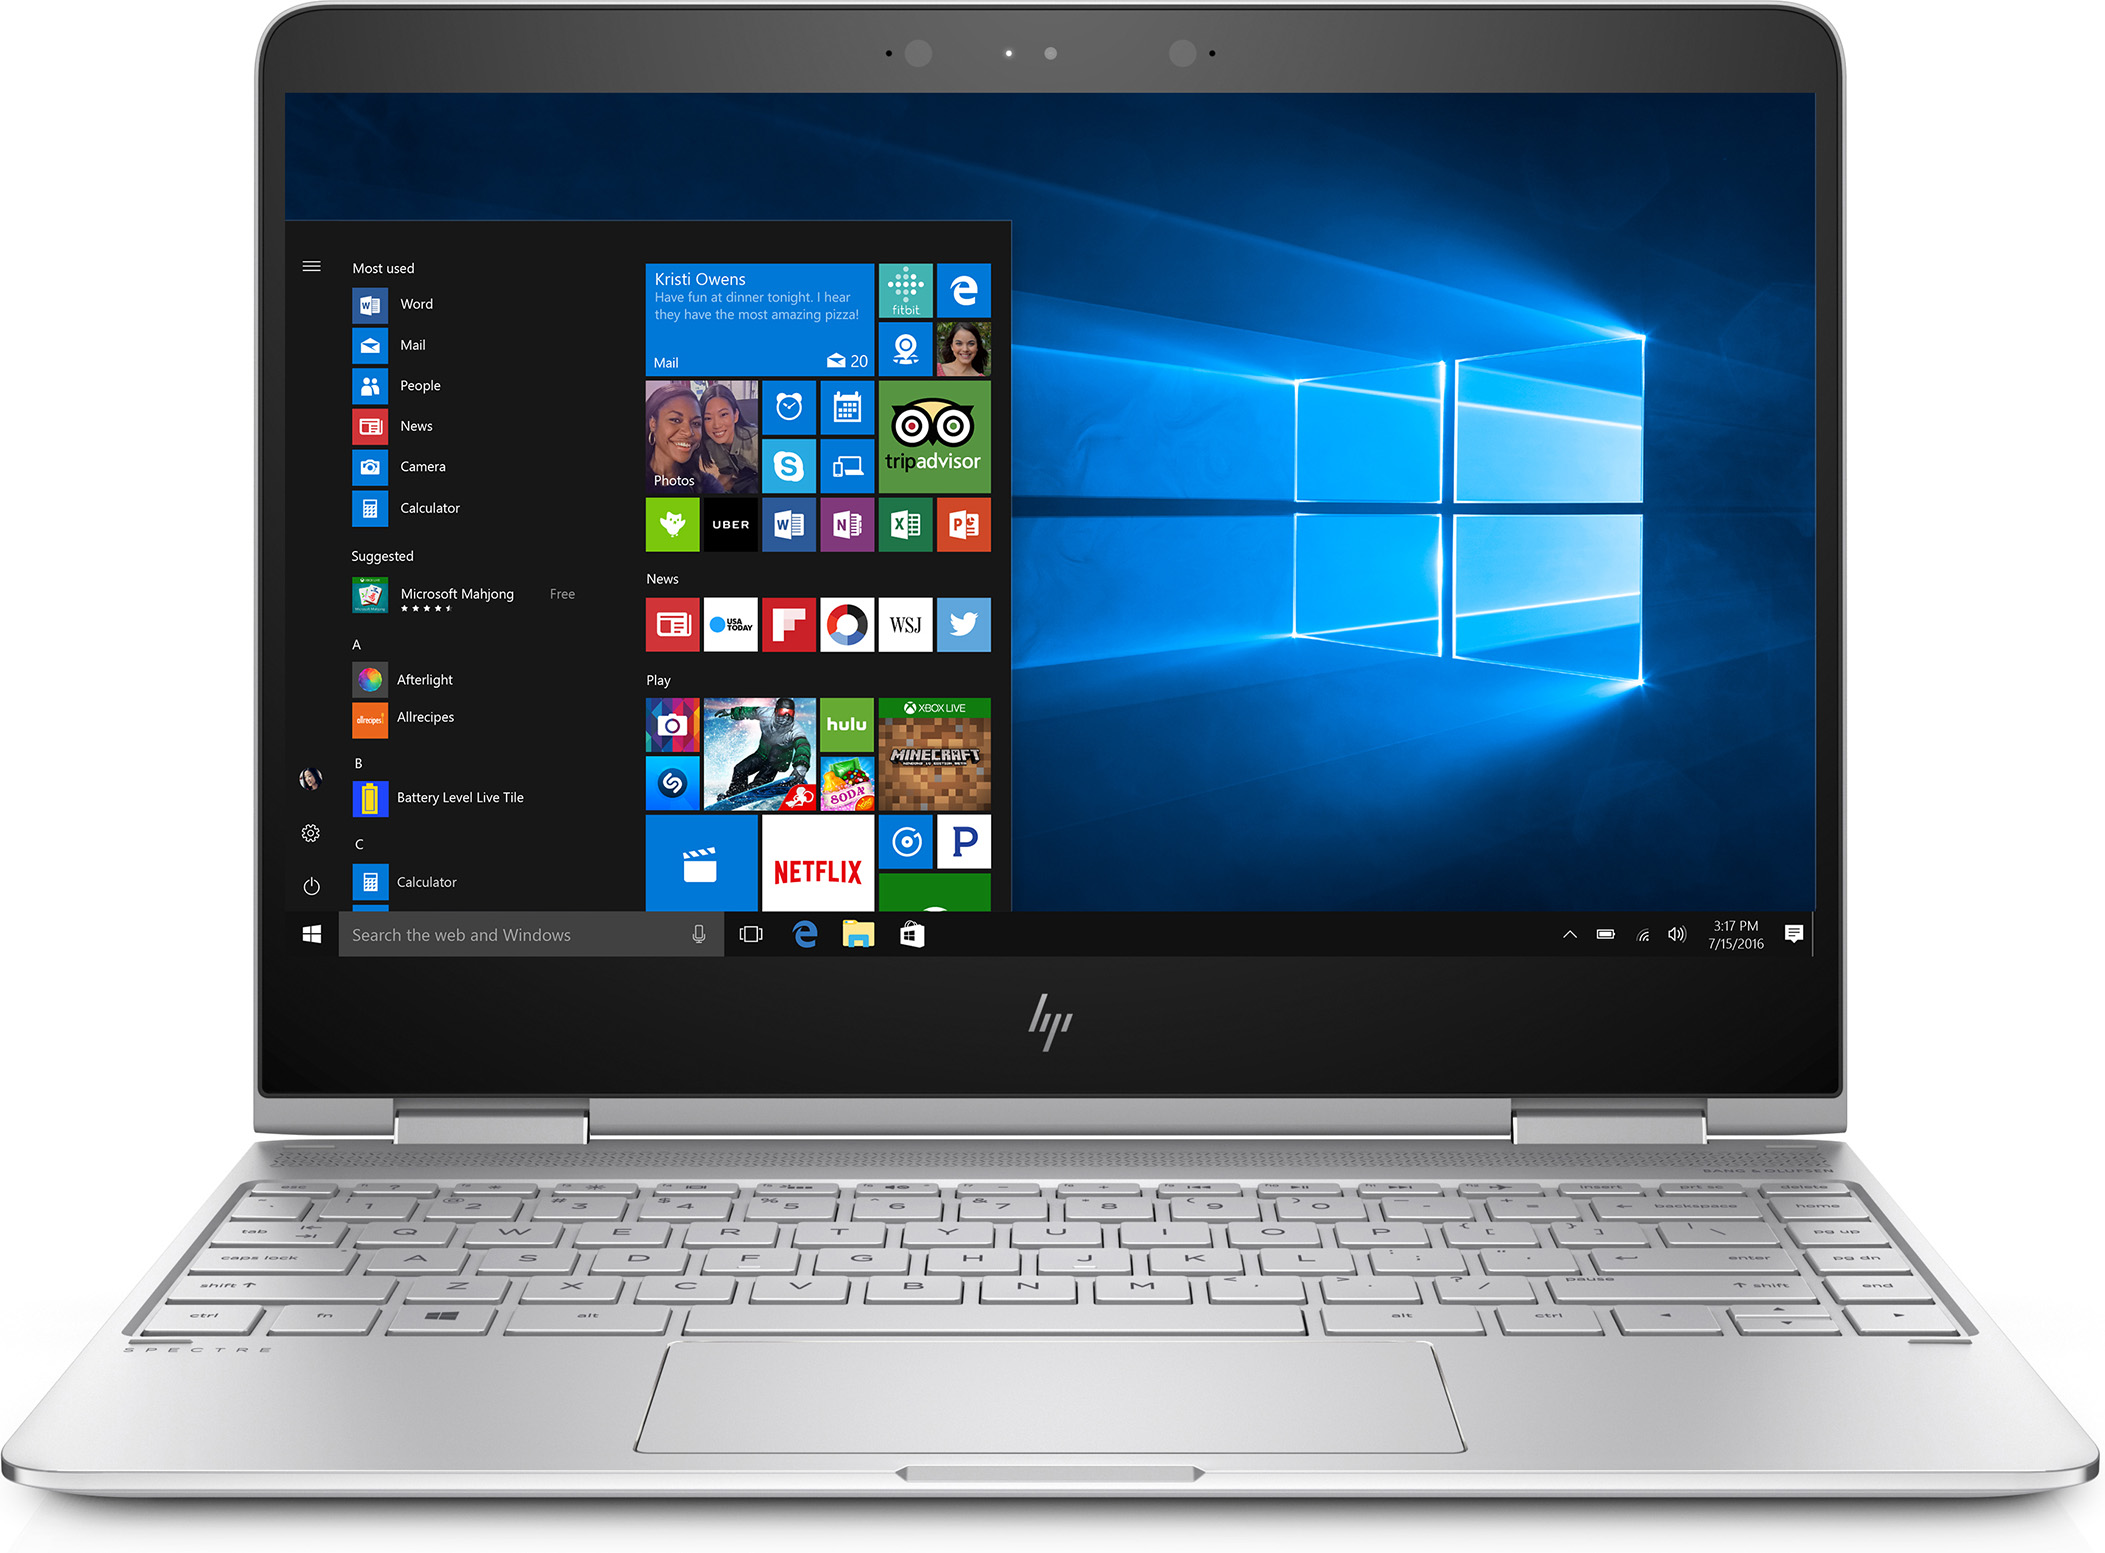 HP Spectre x360 13-w011TU 2 in 1 PC